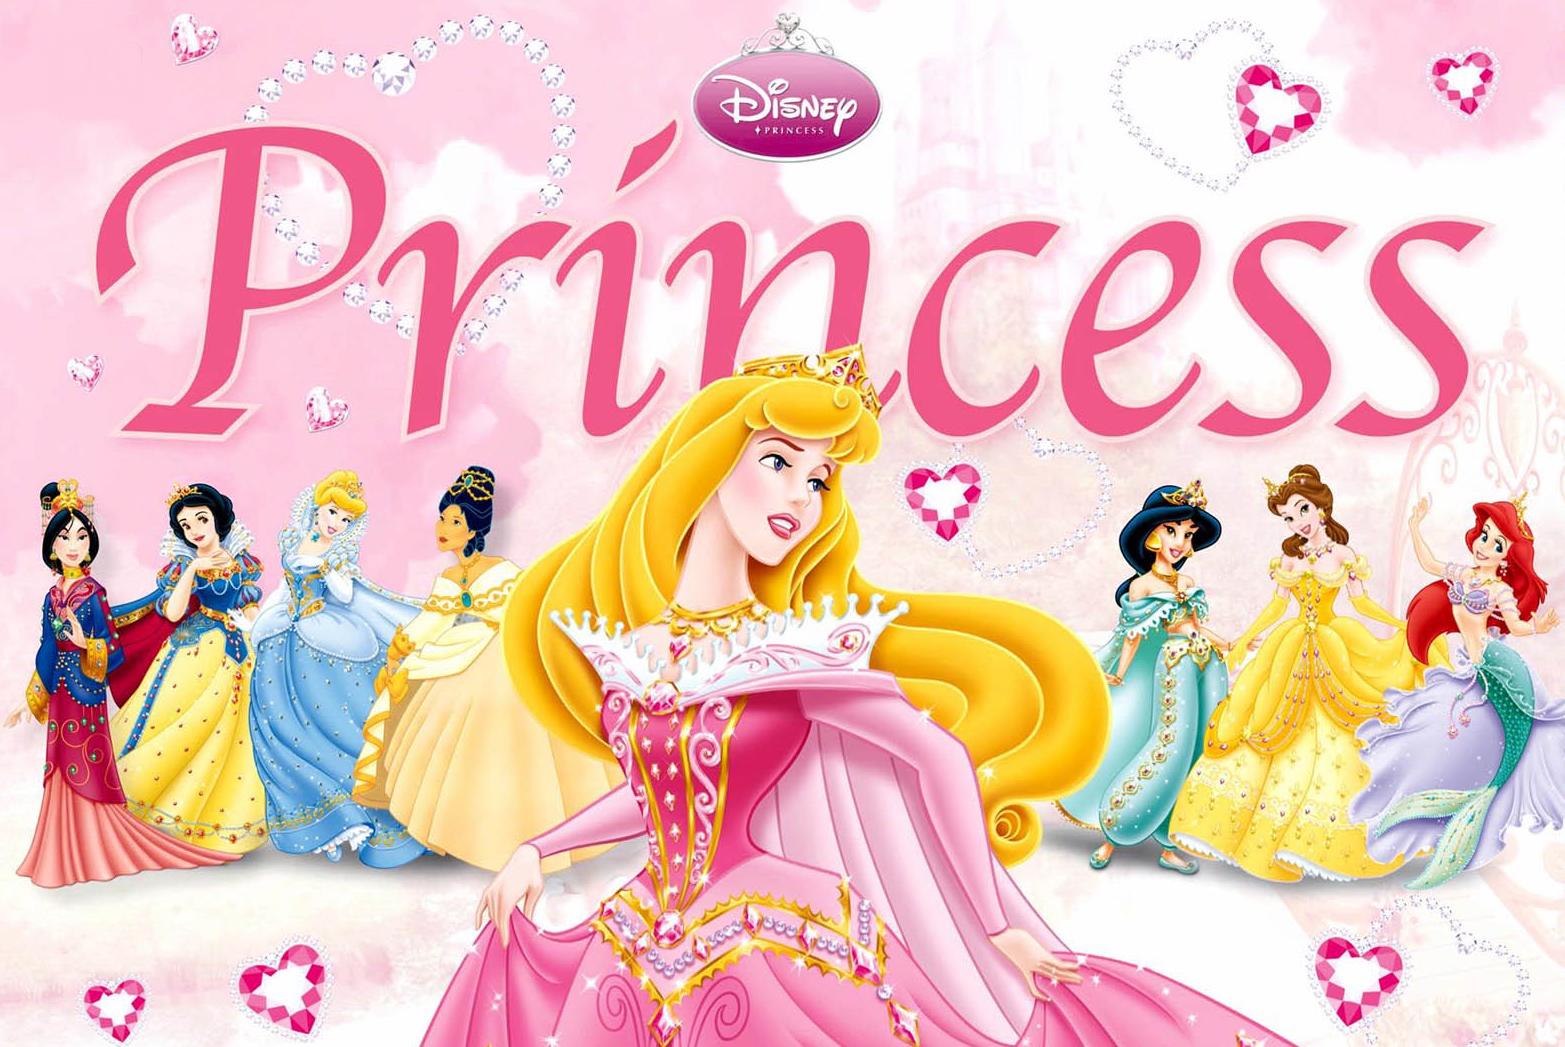 Image - Disney Princess Jewel.png - Disney Wiki